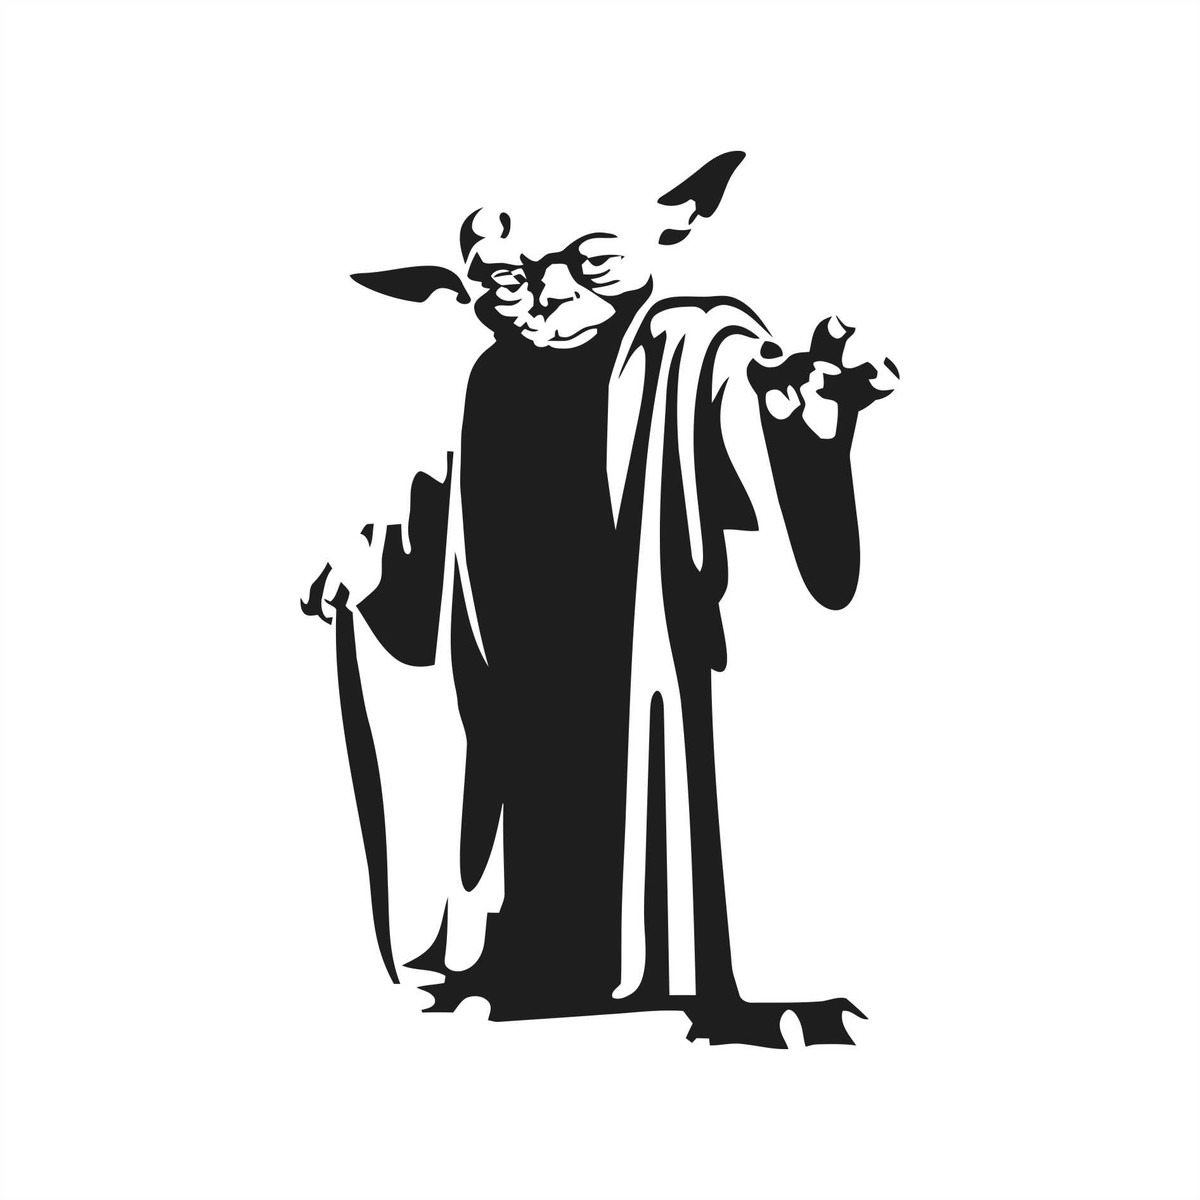 Adesivo Jedi Star Wars Yoda 12x8cm No Elo7